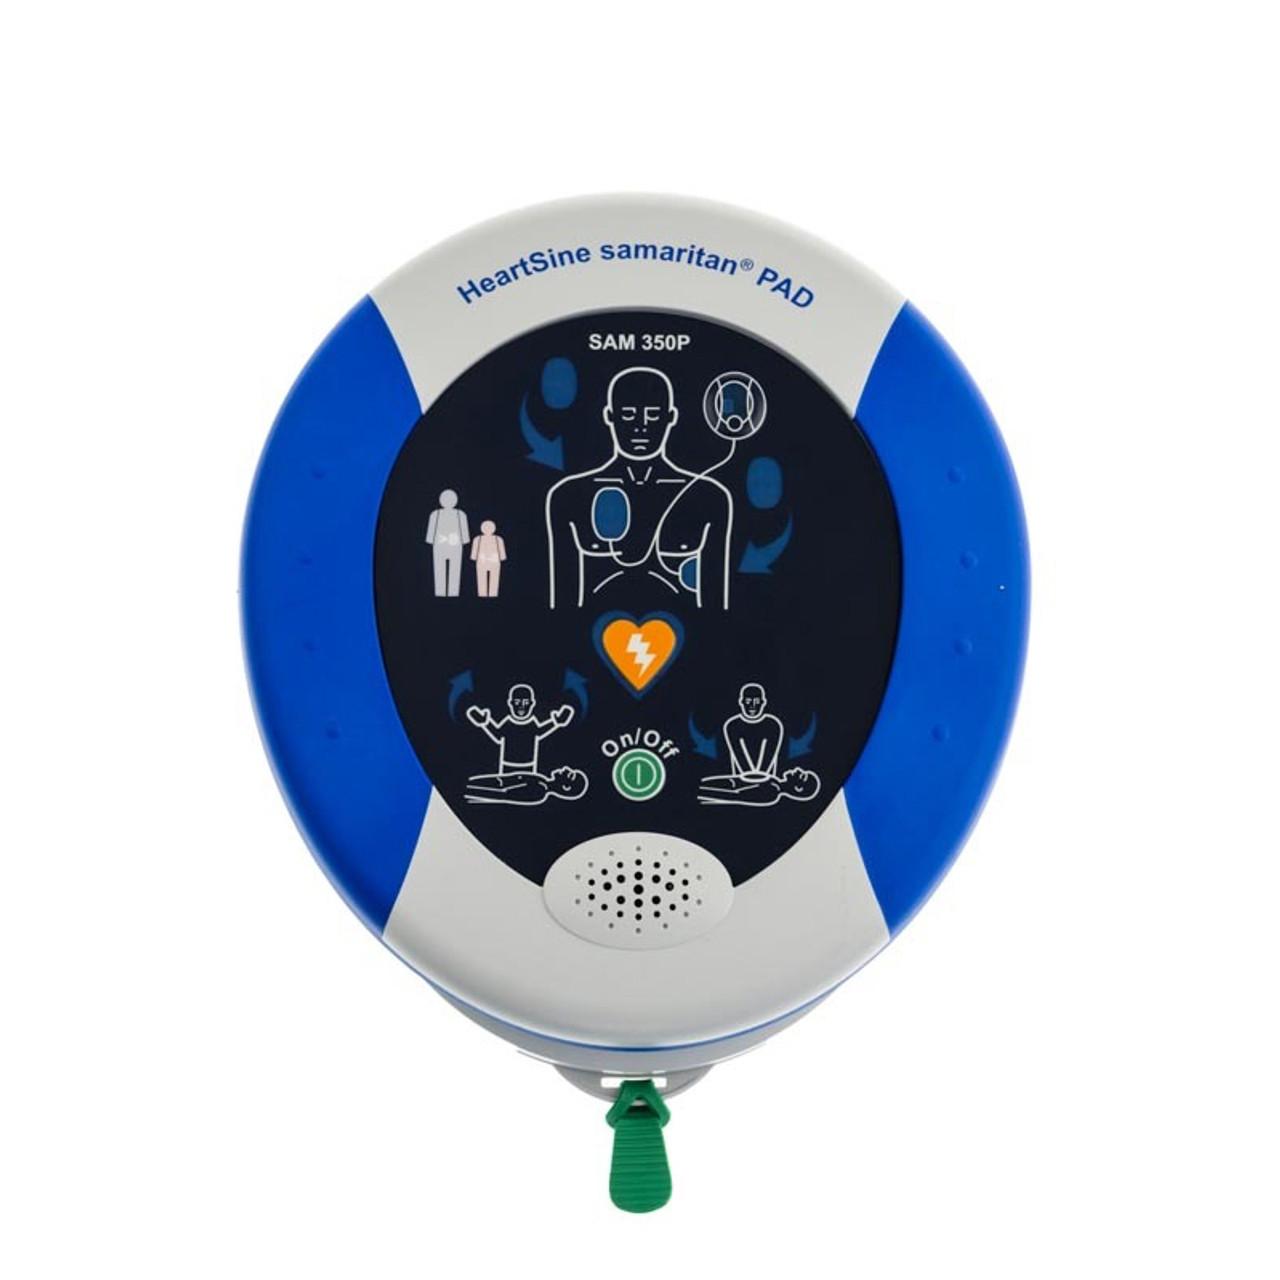 HeartSine® Samaritan® PAD 350P MAP